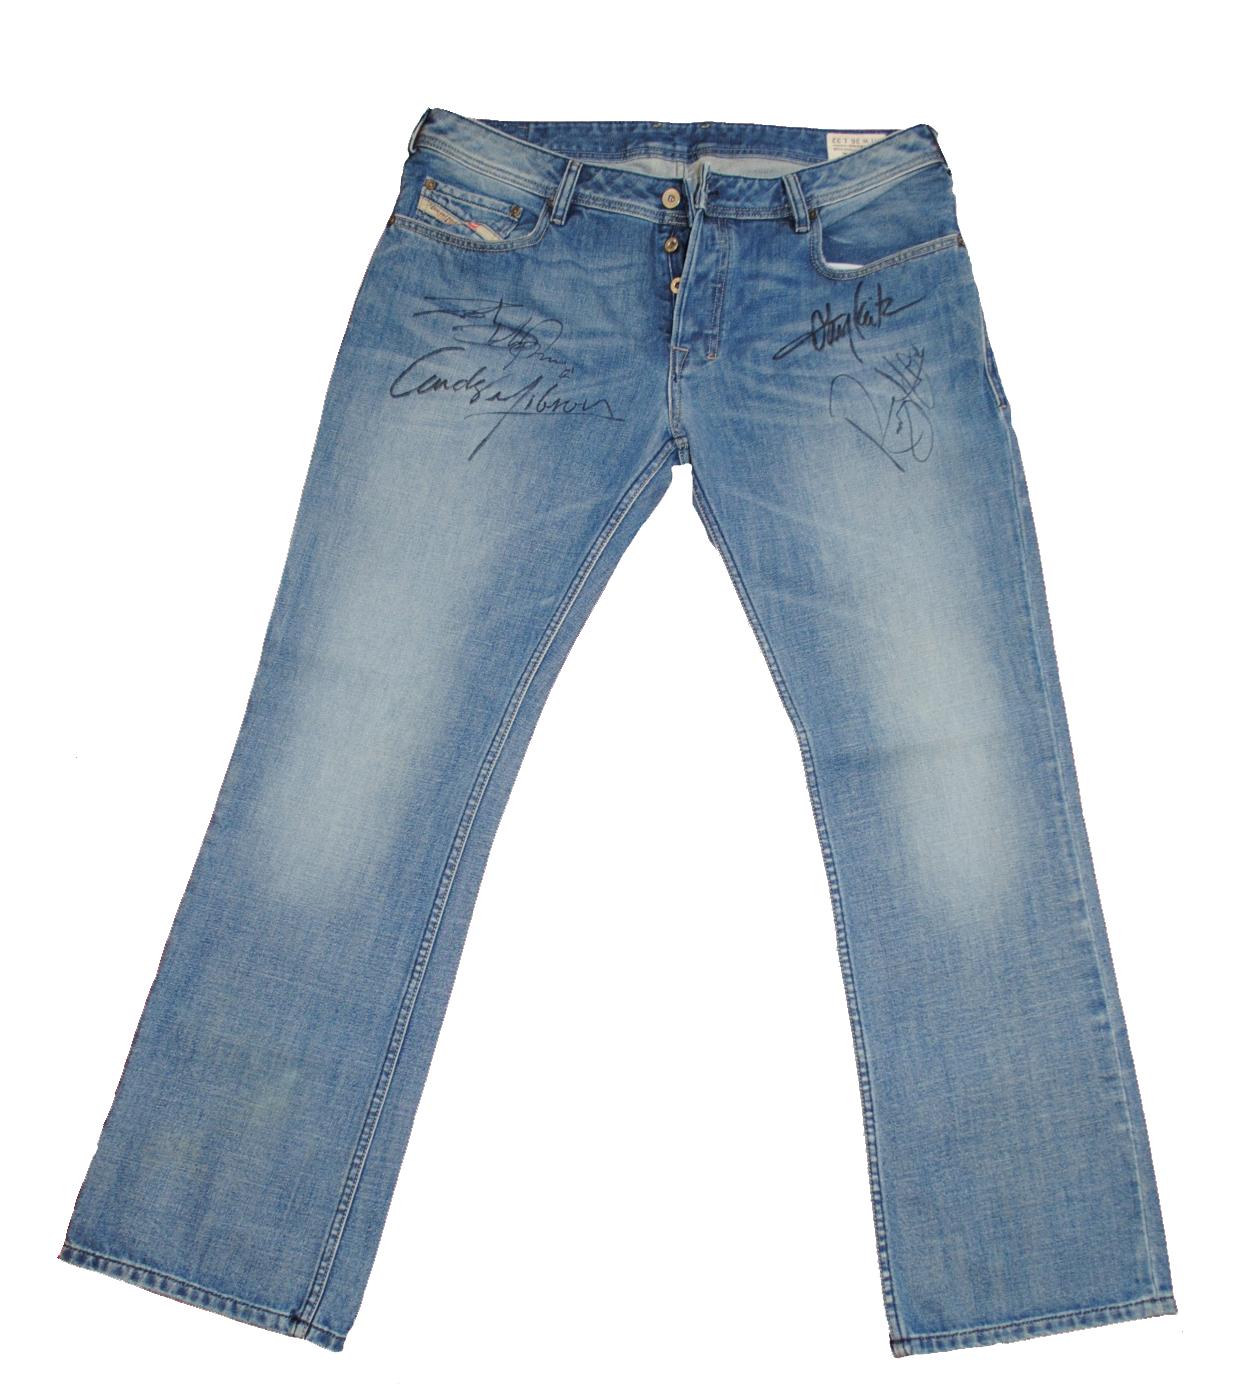 Tobys Jeans Png Image Clothes Jeans Garment